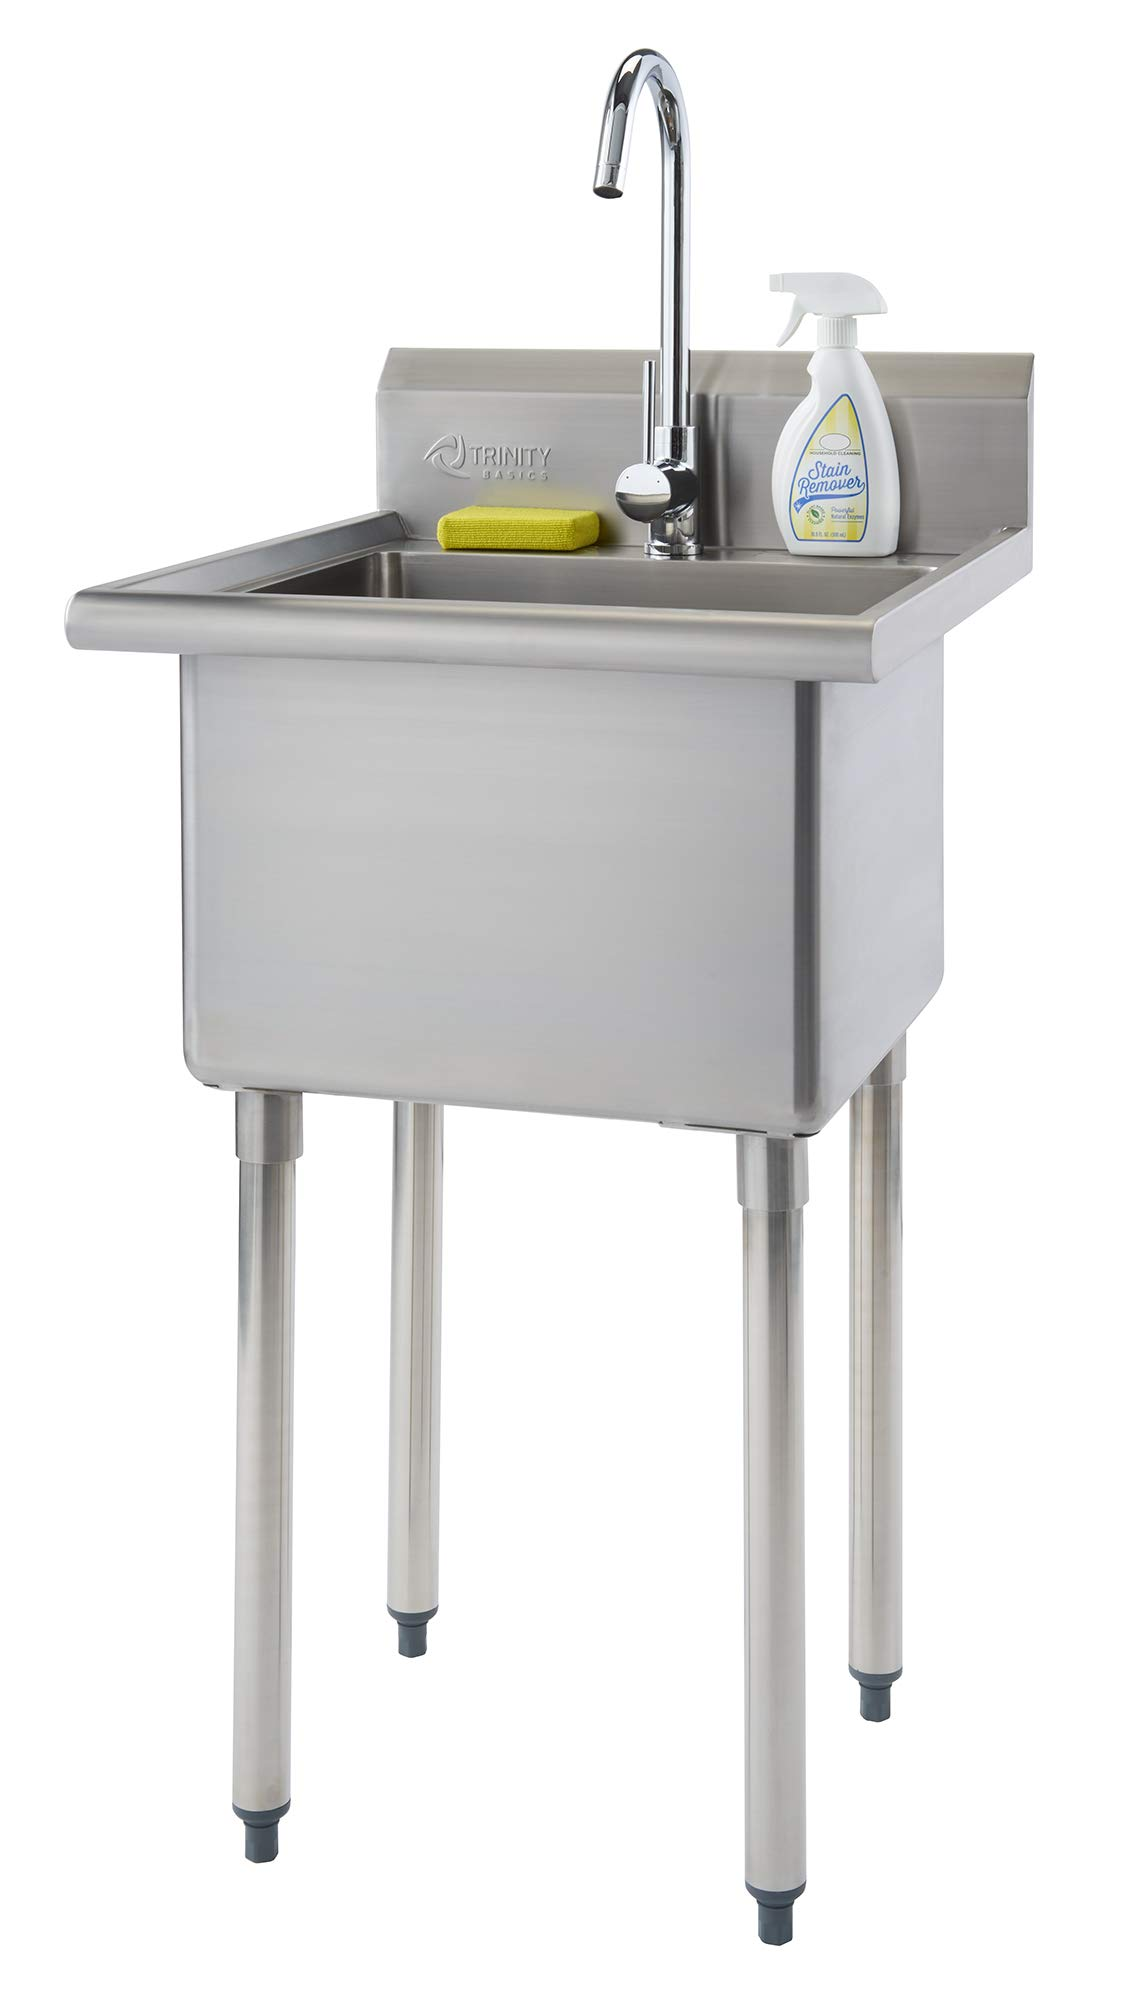 TRINITY THA 0307 Basics Stainless Utility